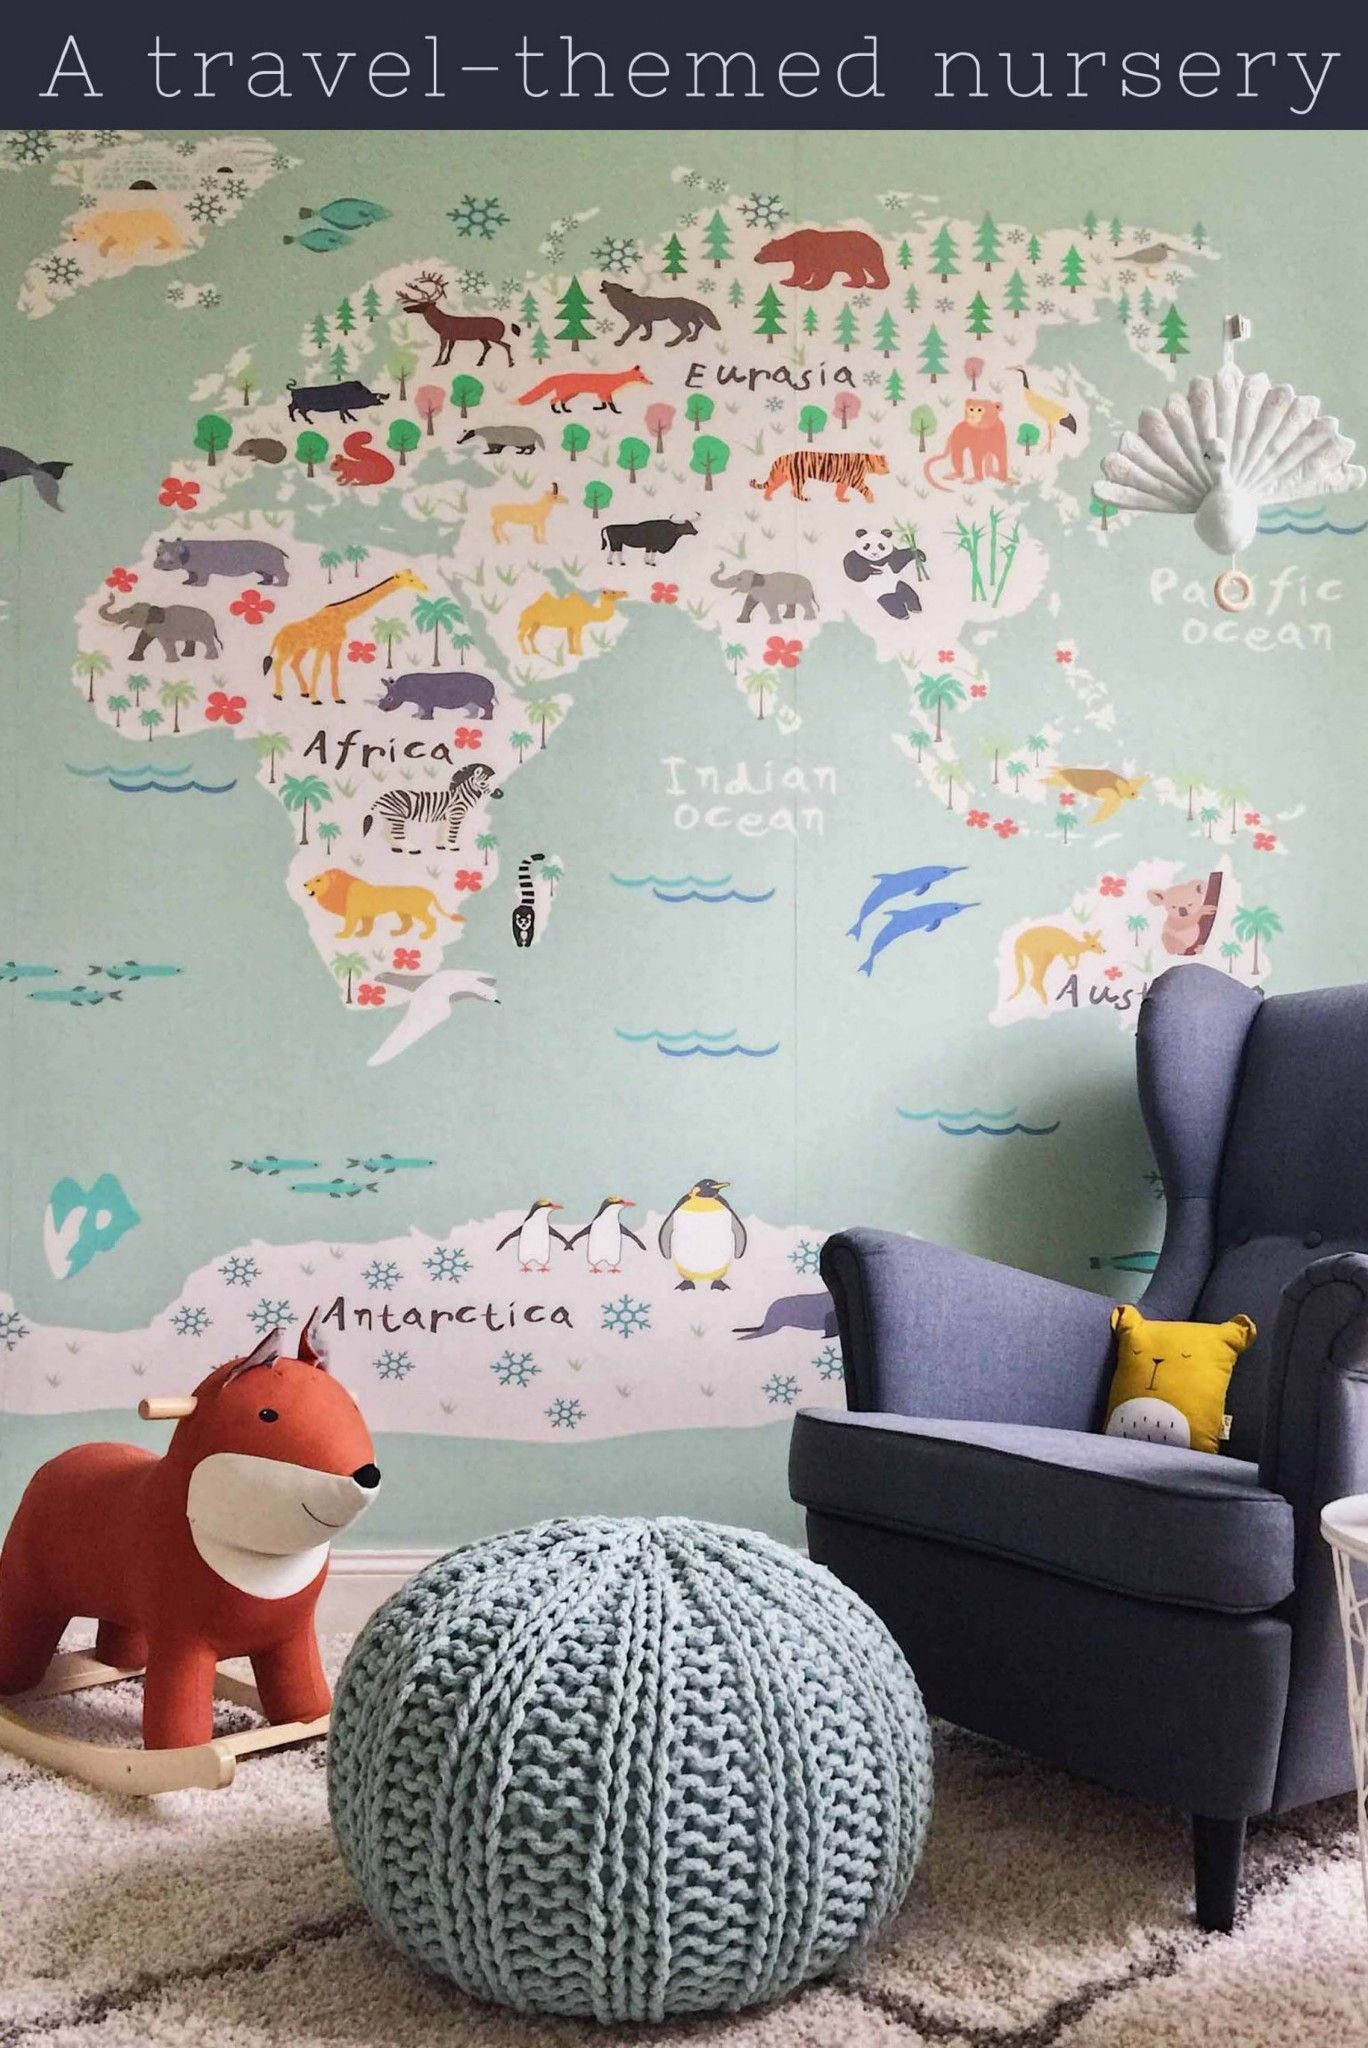 travel themed nursery | future baby | pinterest | nursery themes